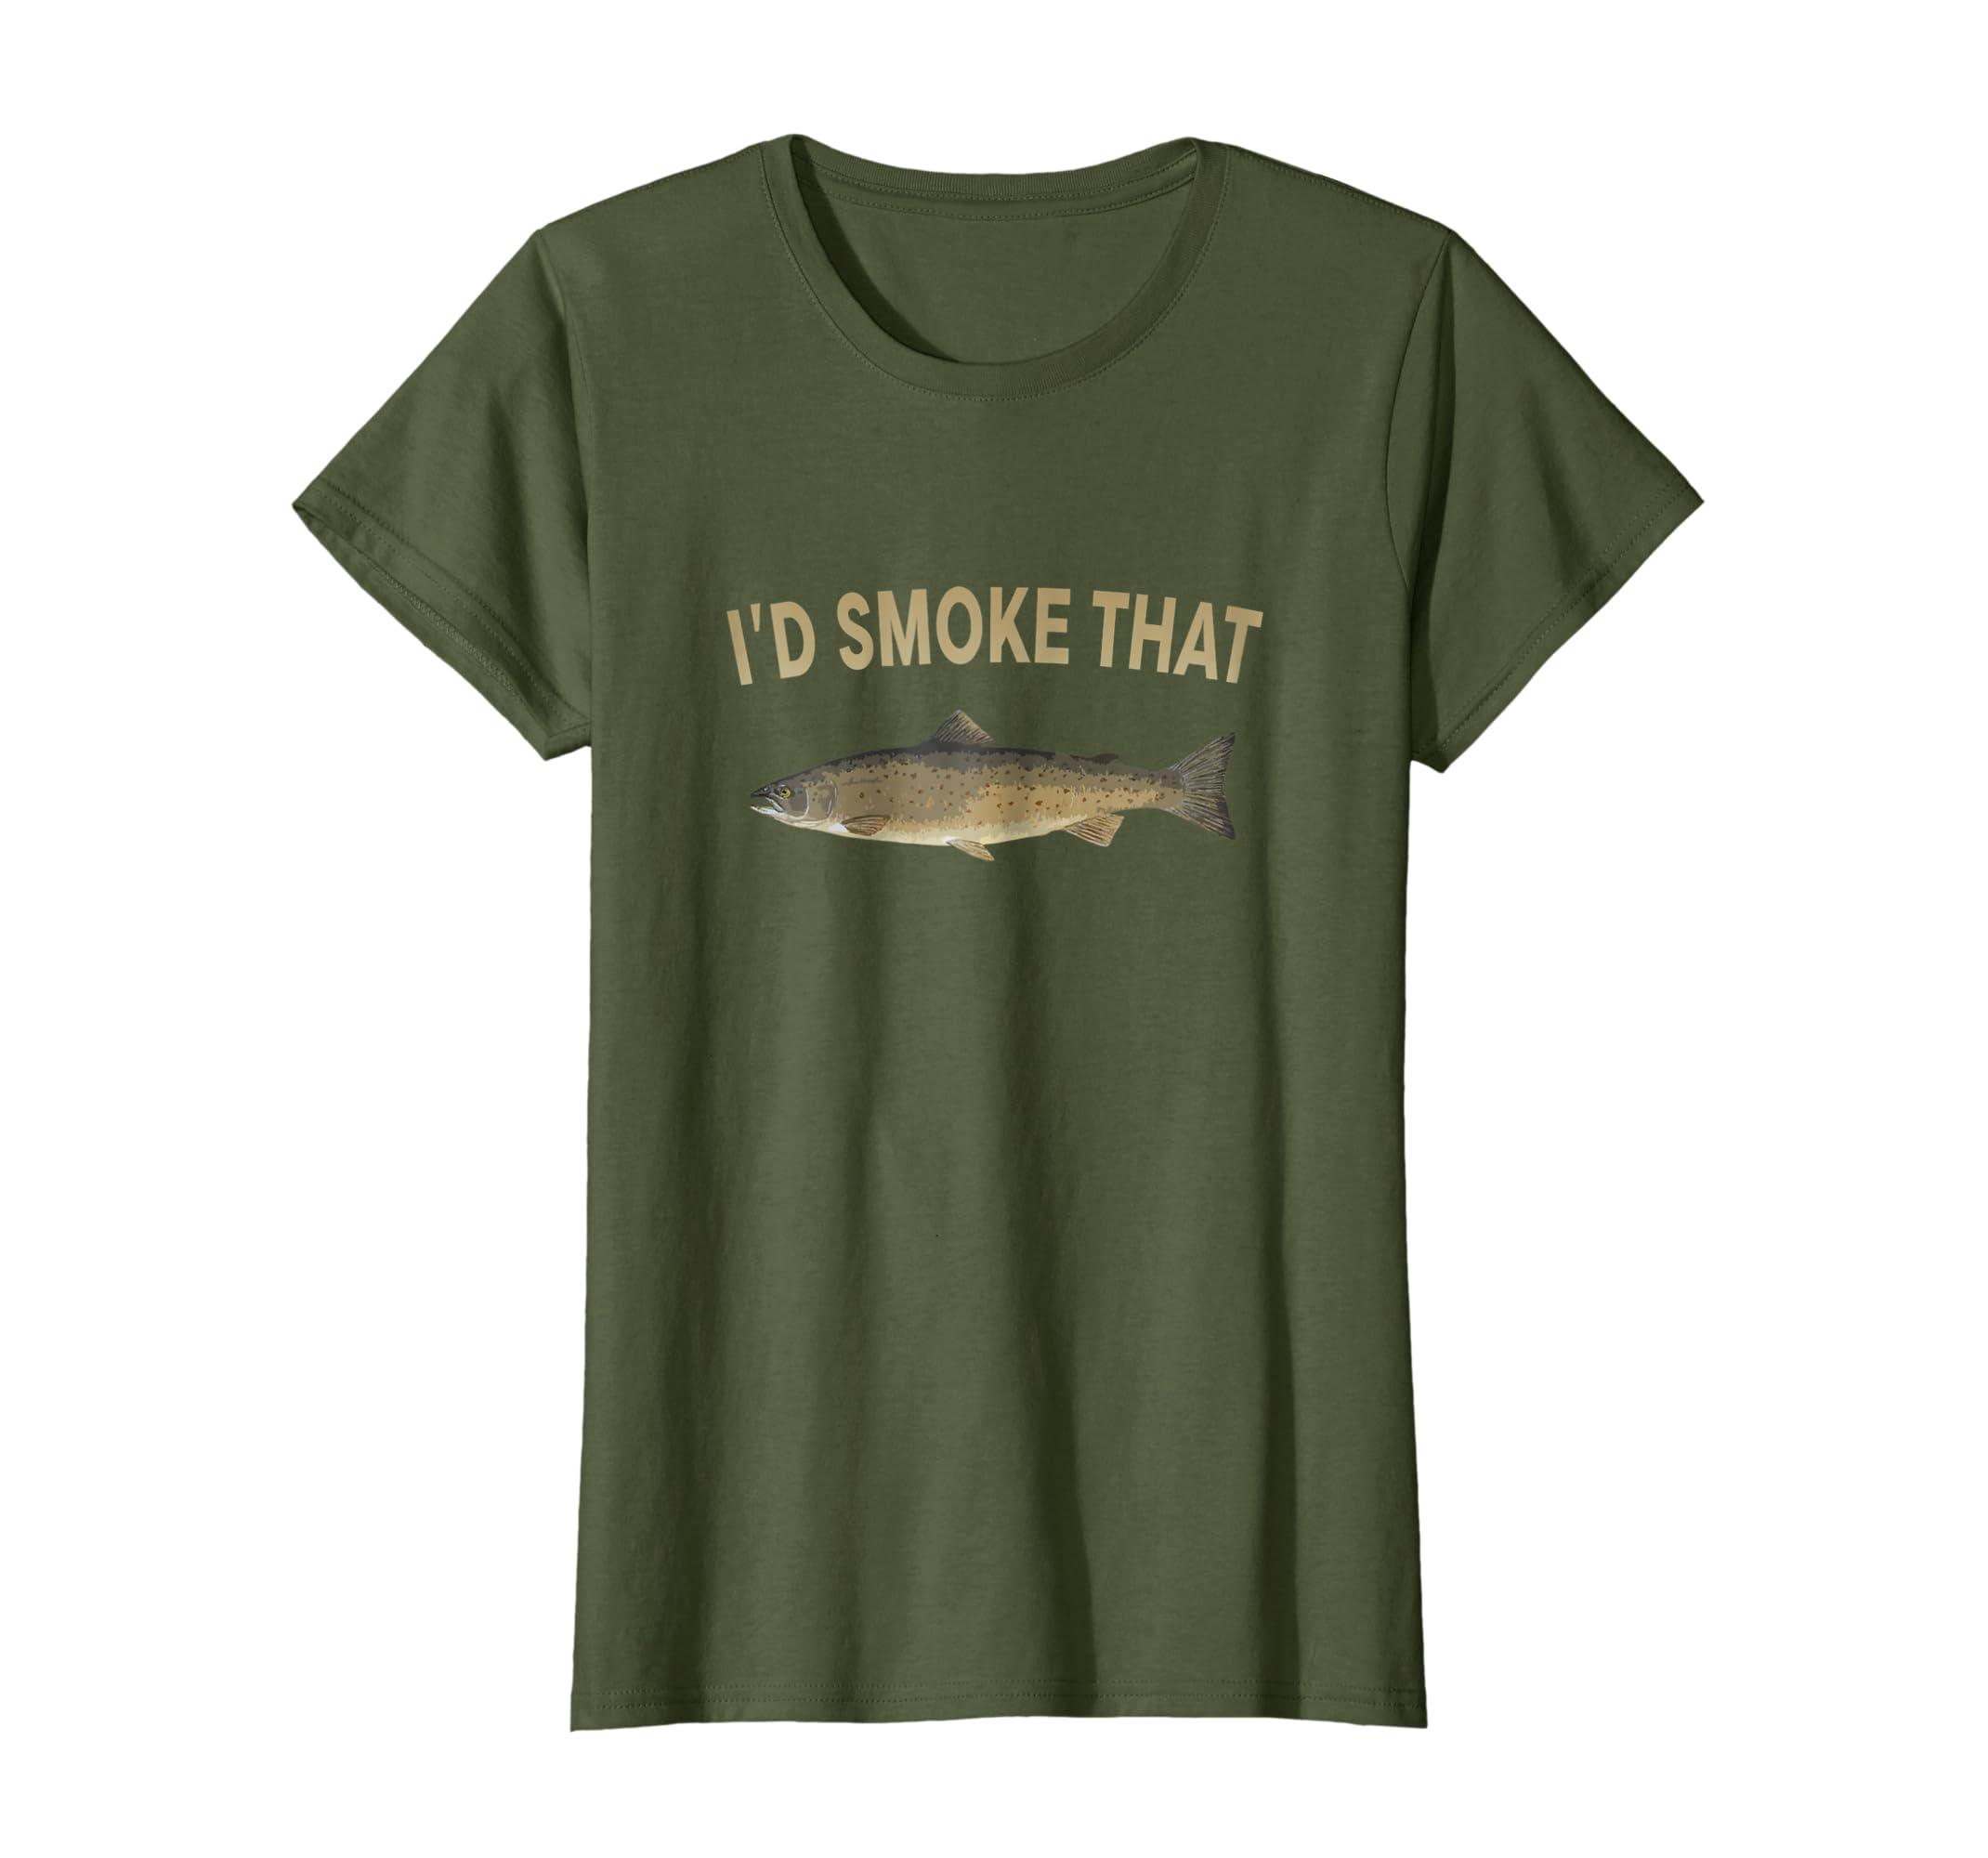 I'd Smoke That Salmon Fishing Funny Barbecue Shirts-Colonhue